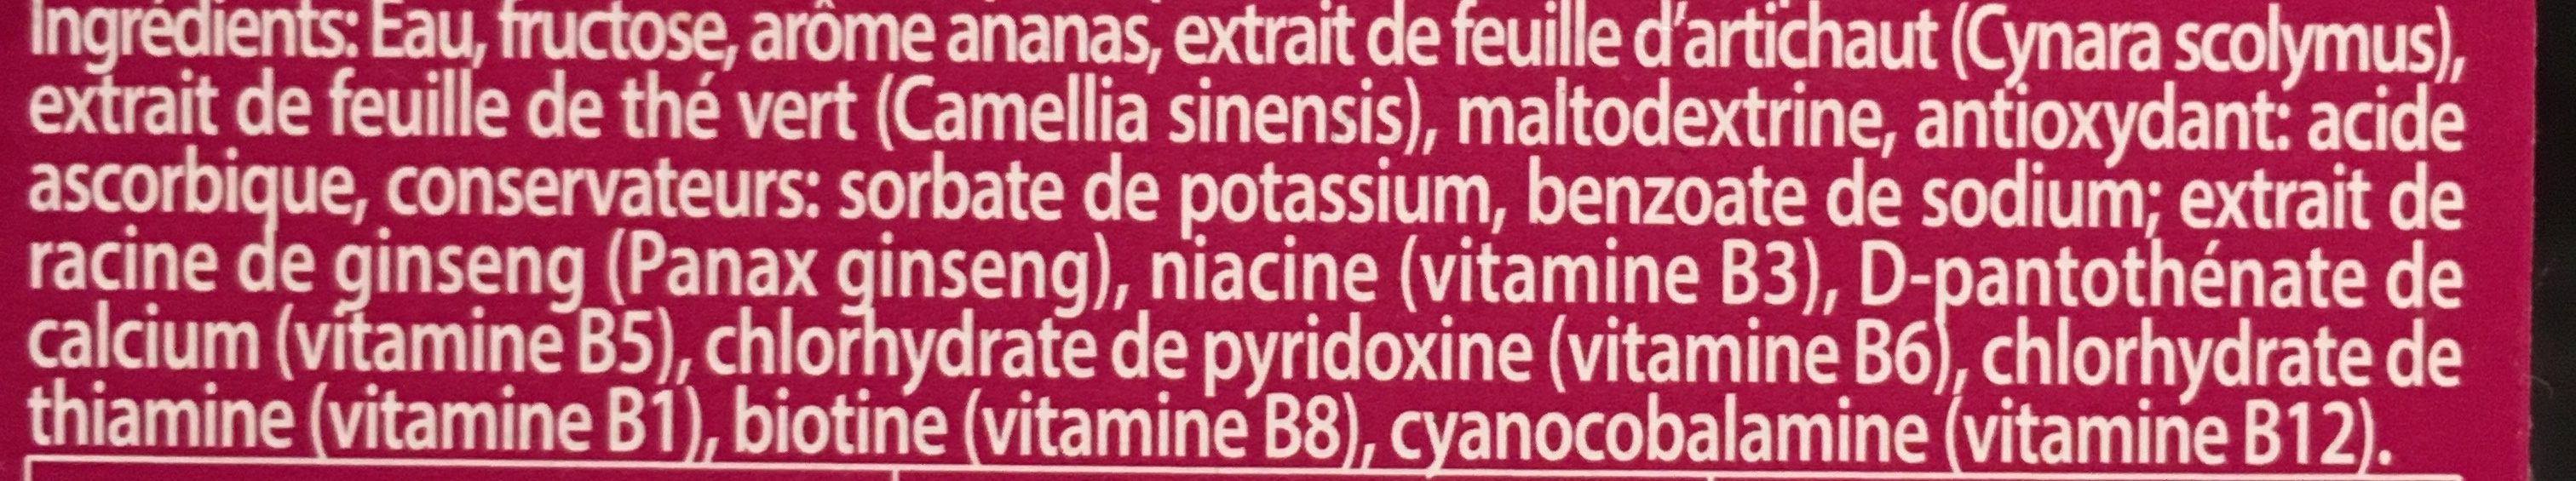 Best of tv/M6 4 Shots Minceur Ananas 14 - Ingredients